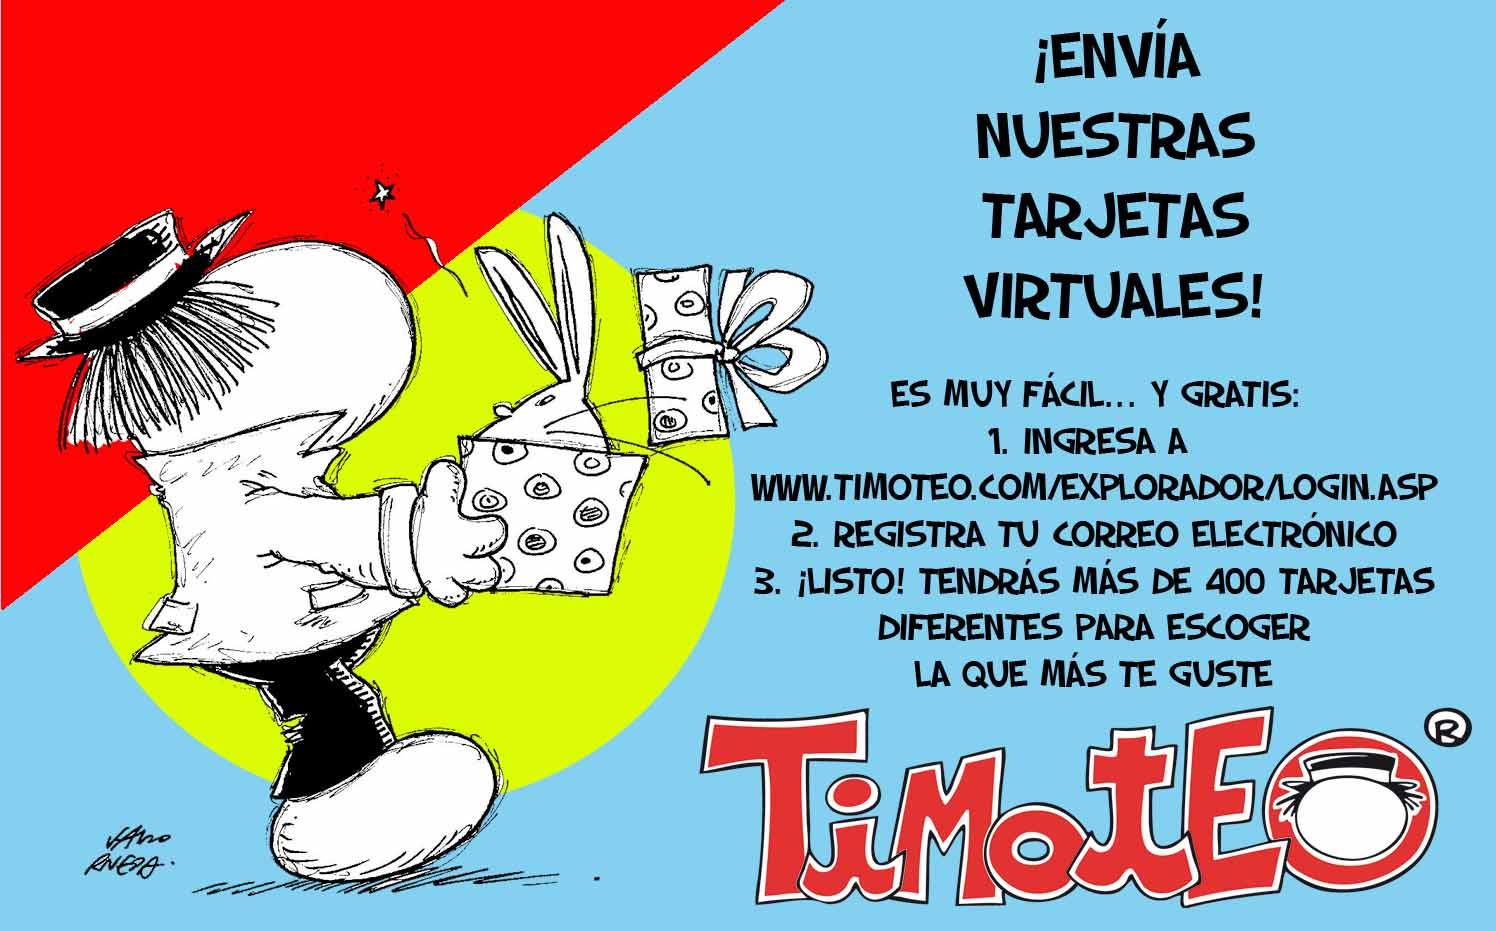 Tarjetas timoteo gratis - Imagui